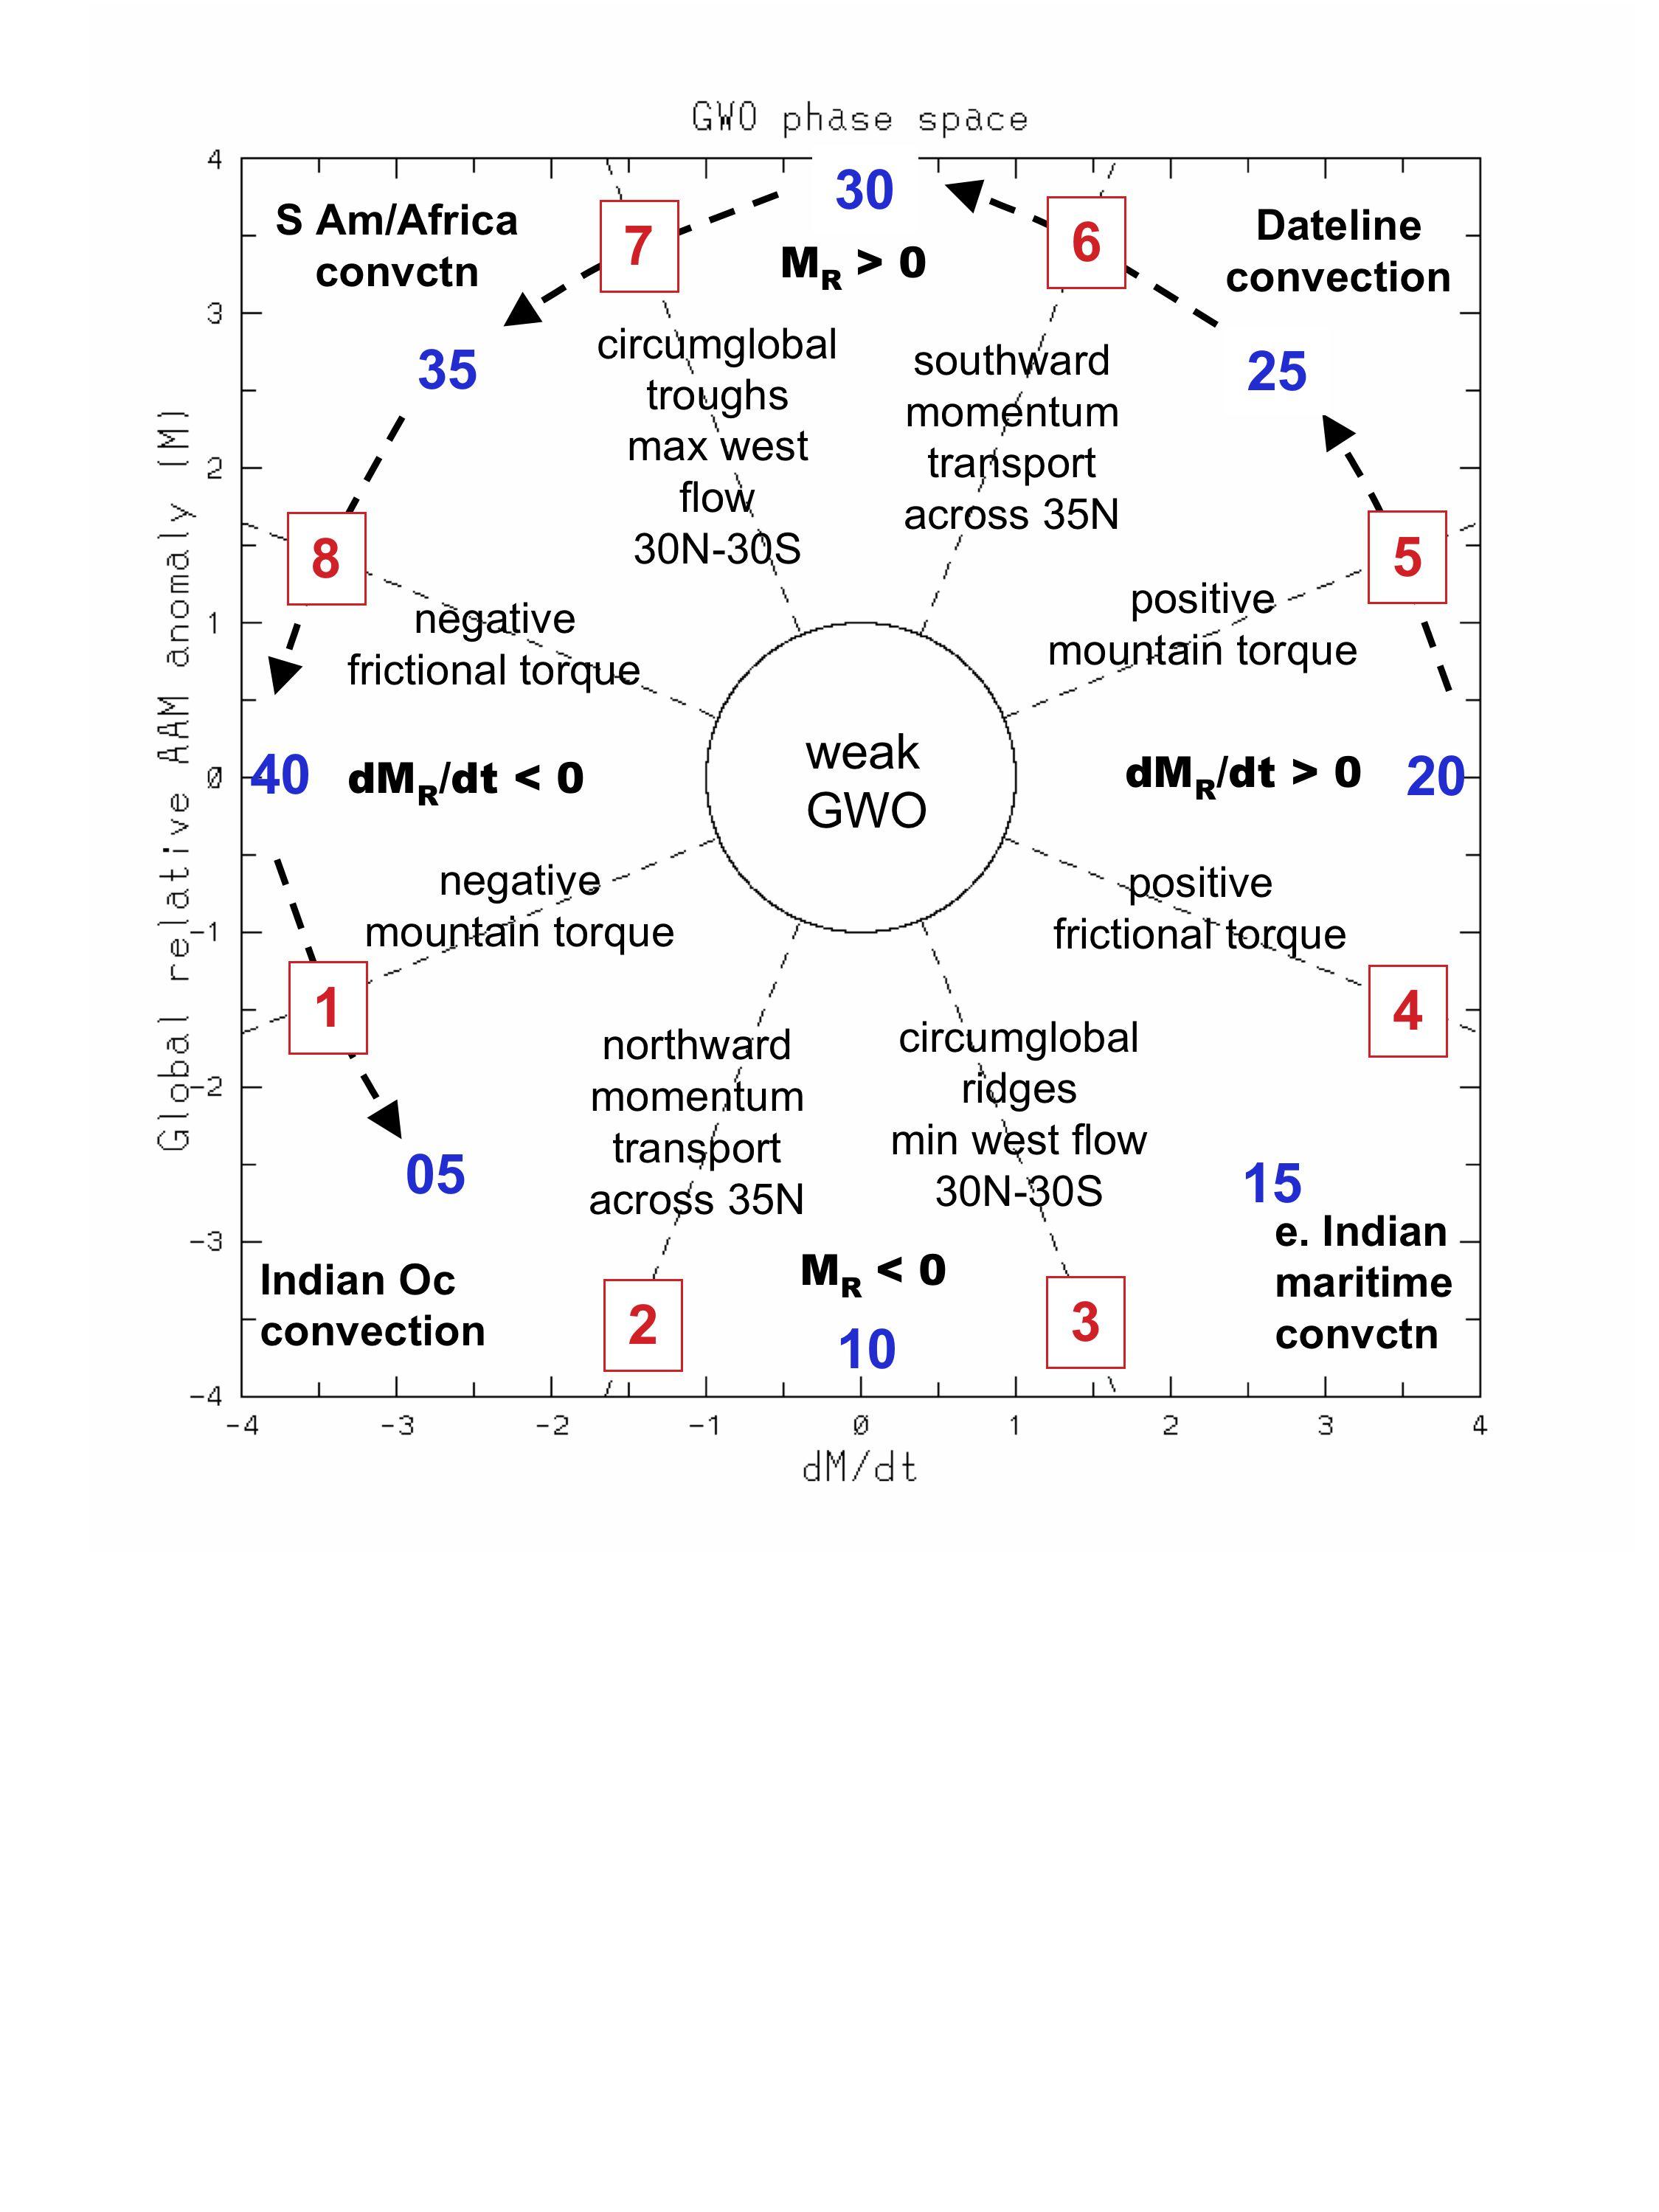 Worksheets Global Winds Worksheet atmosphere oss foundation global wind oscillation gwo phase plot